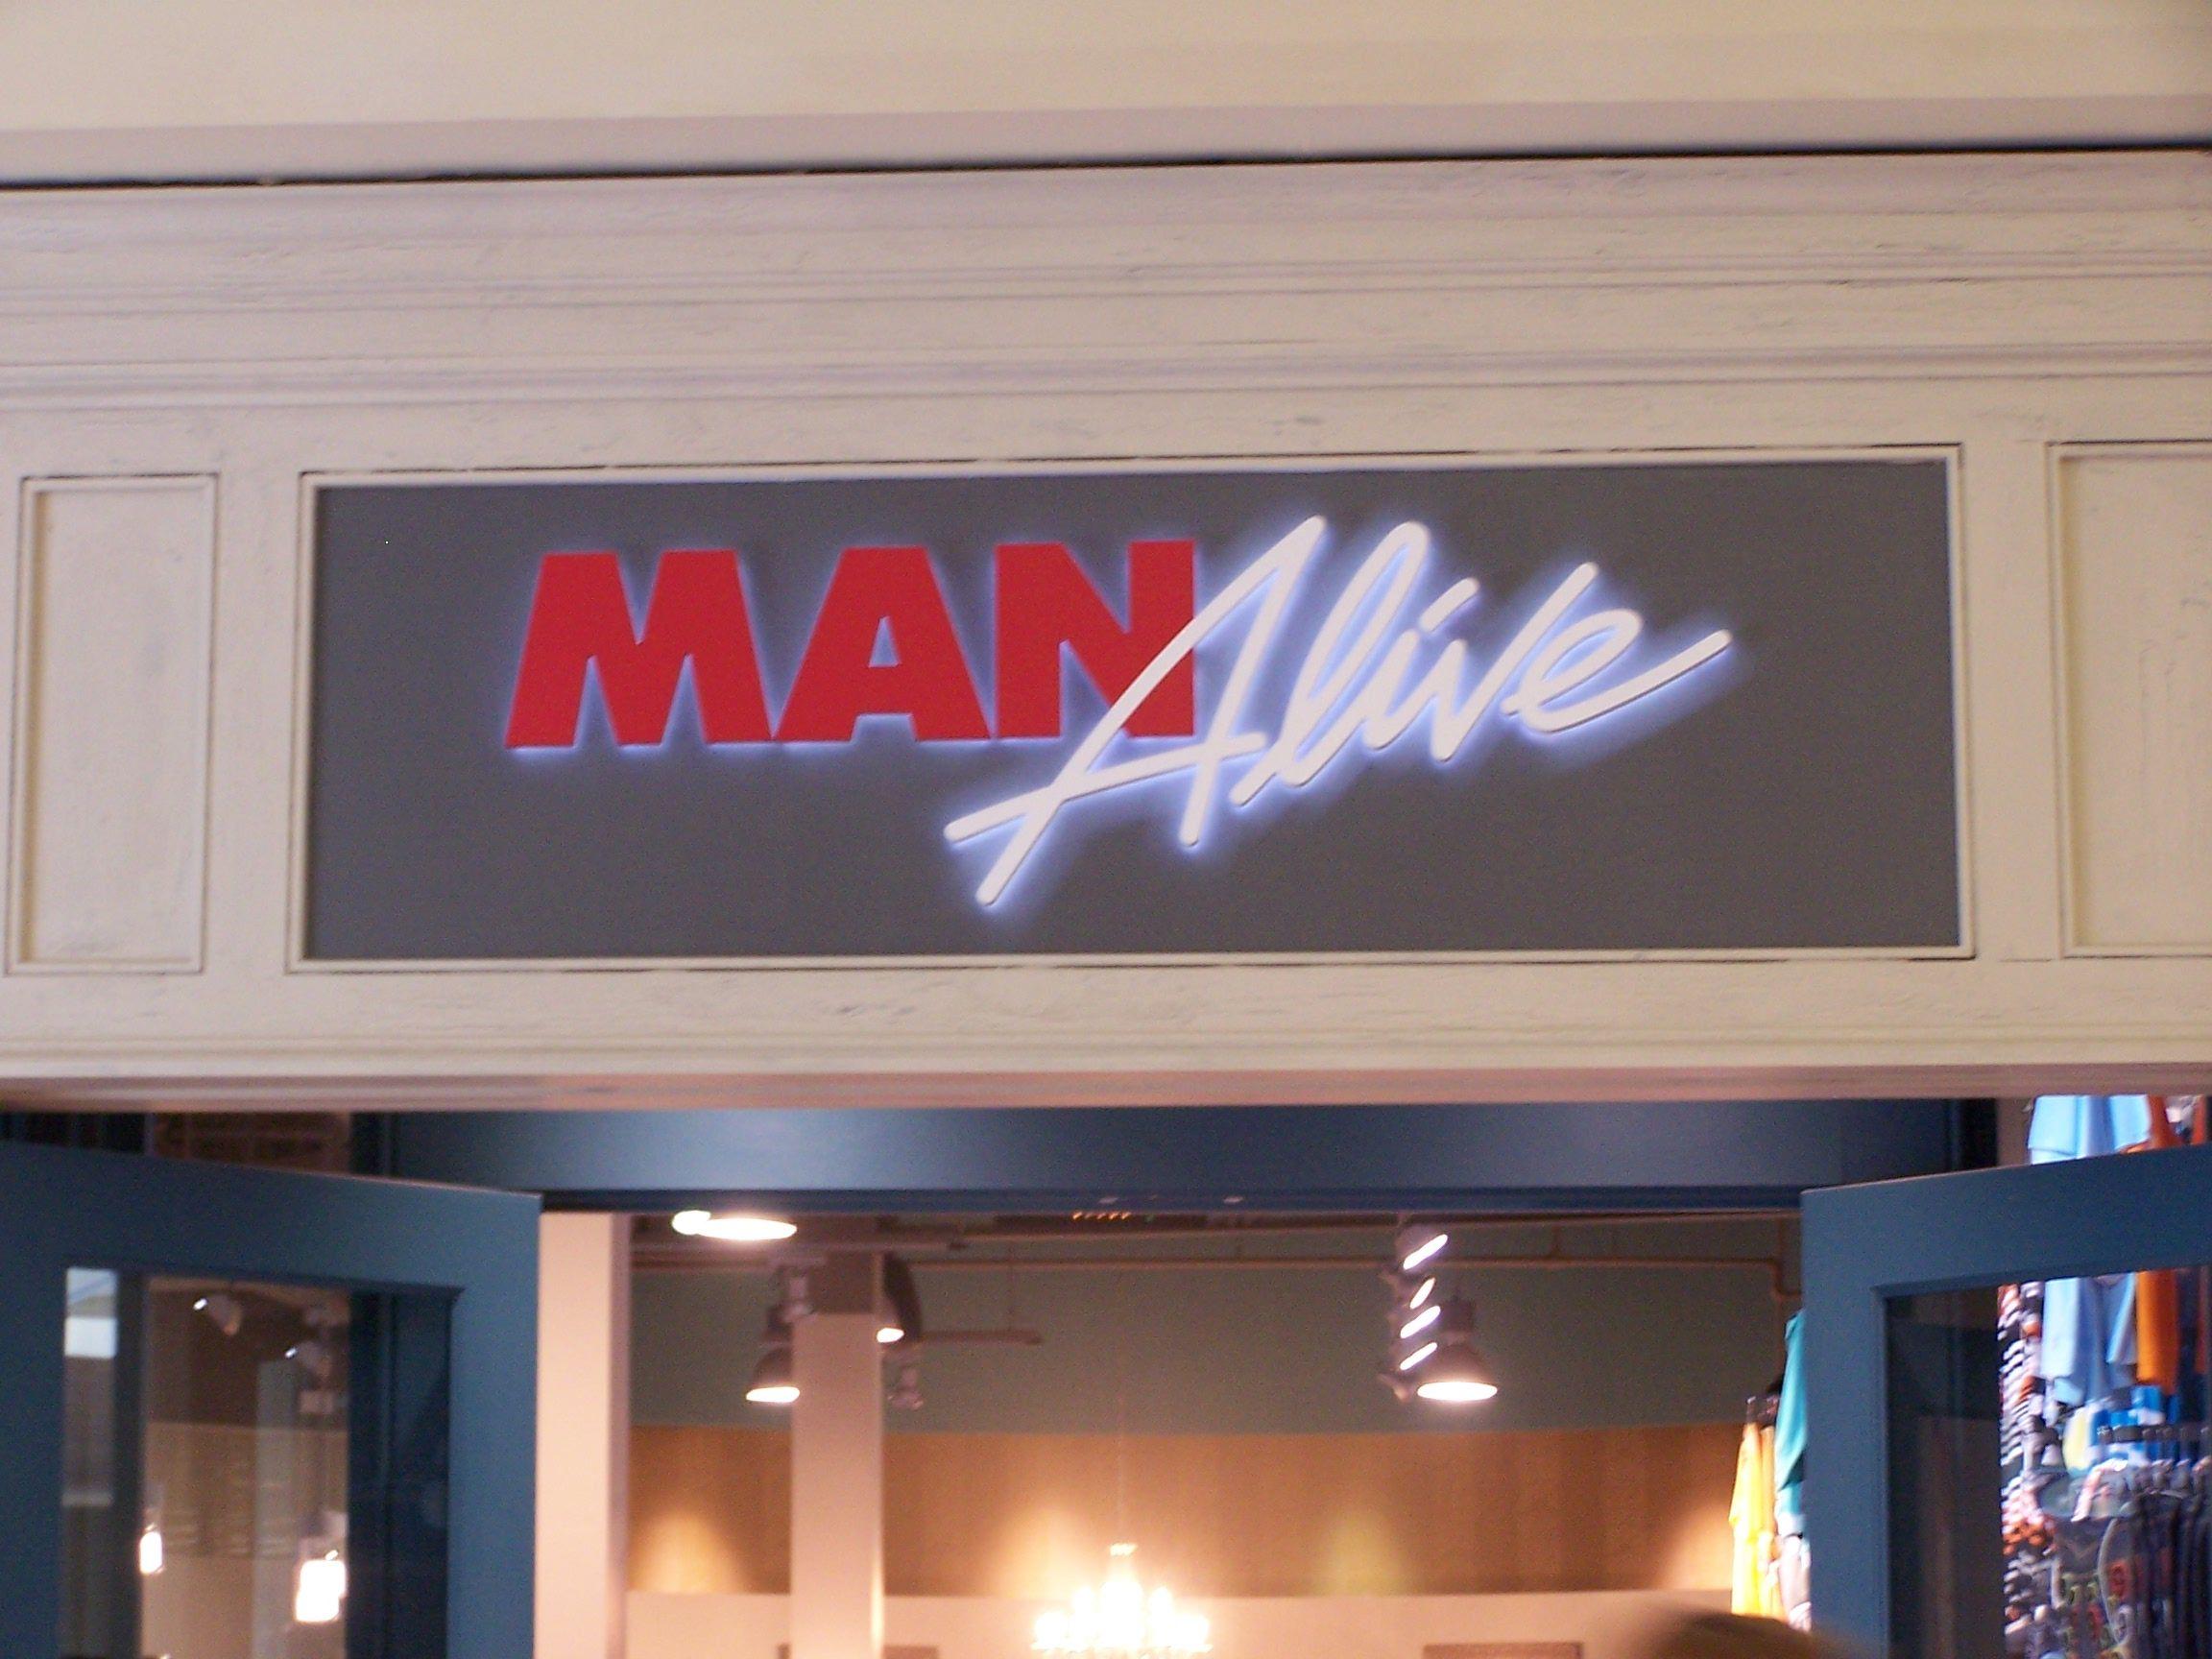 c56448152db4 Another super creative men's clothing store name! (Oglethorpe Mall,  Savannah, GA)